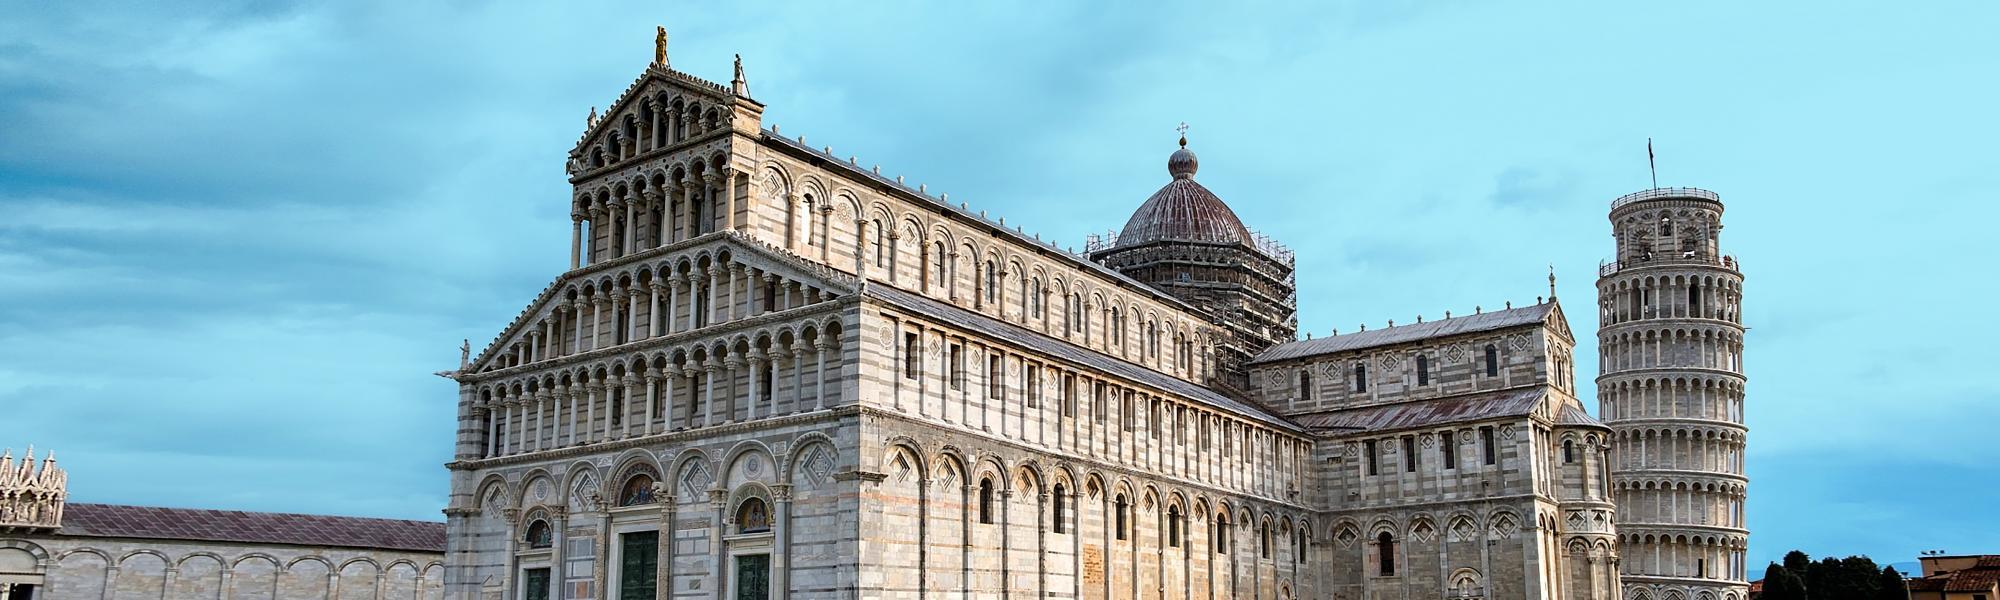 Duomo di Pisa e Torre pendente